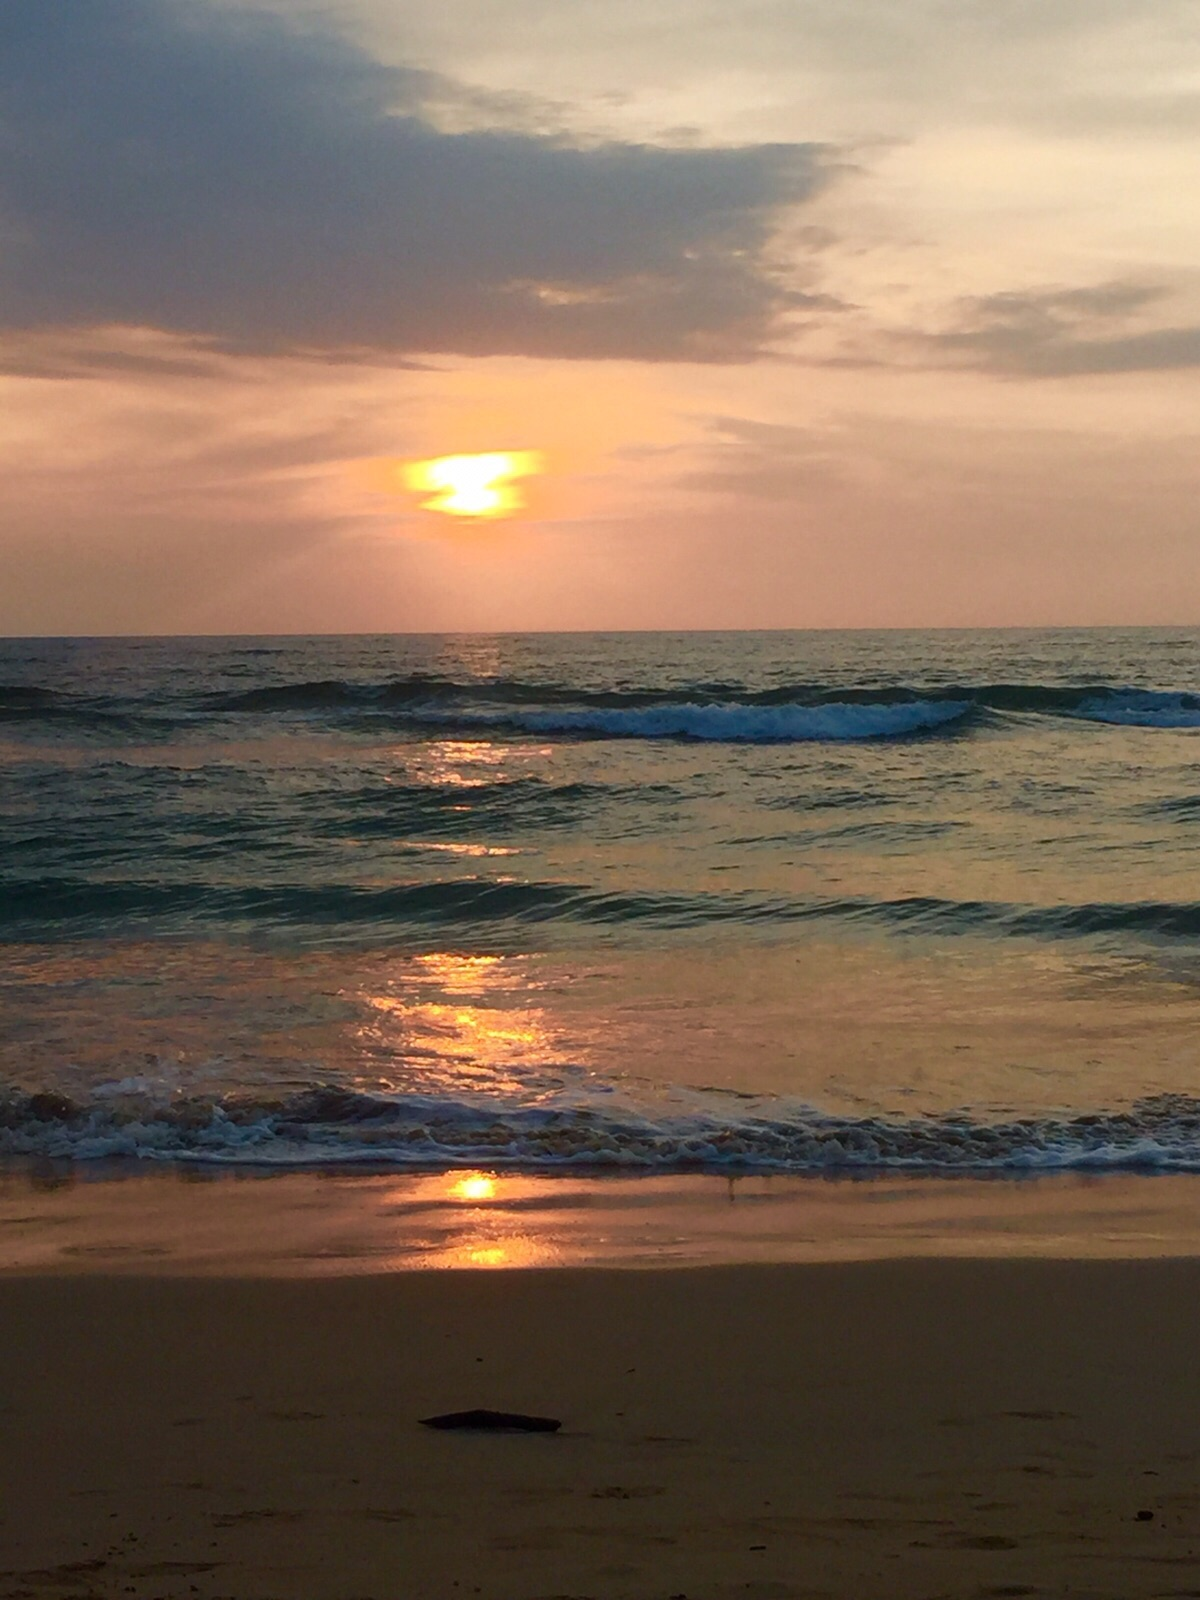 A honeymoon at Centara Ceysands Resort and Spa Sri Lanka - Sunset